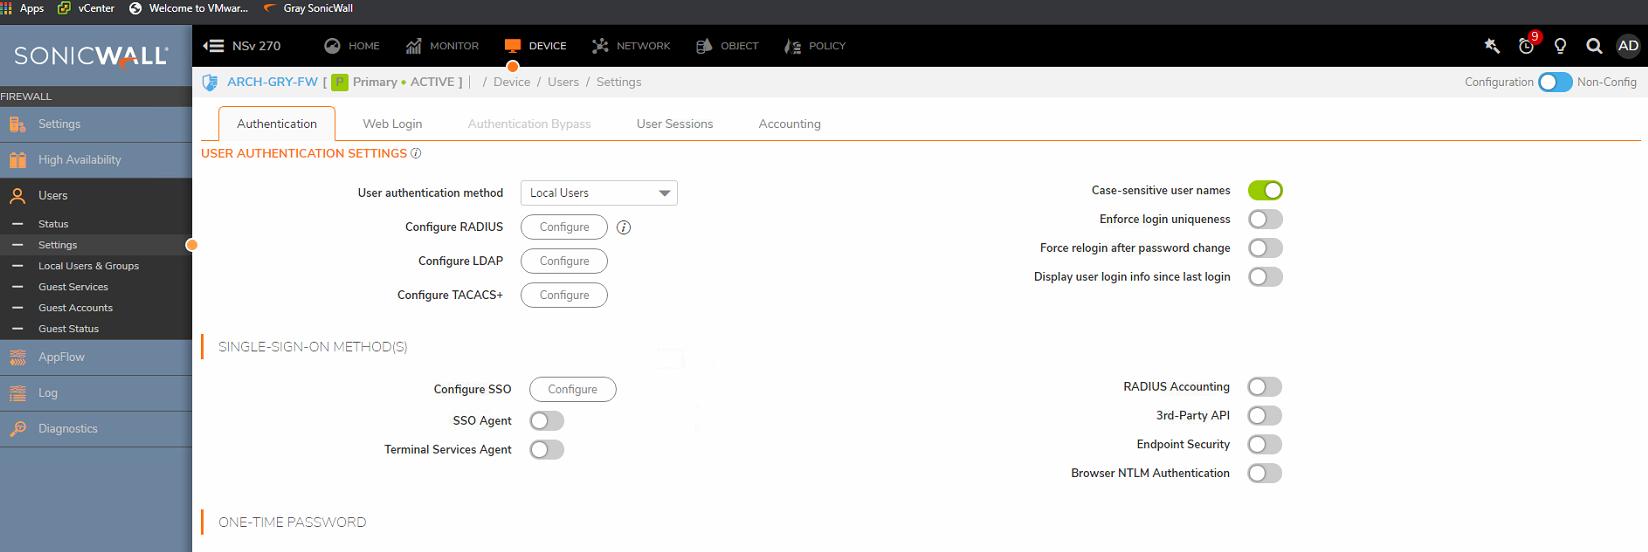 Screenshot 2021-01-21 111345.png